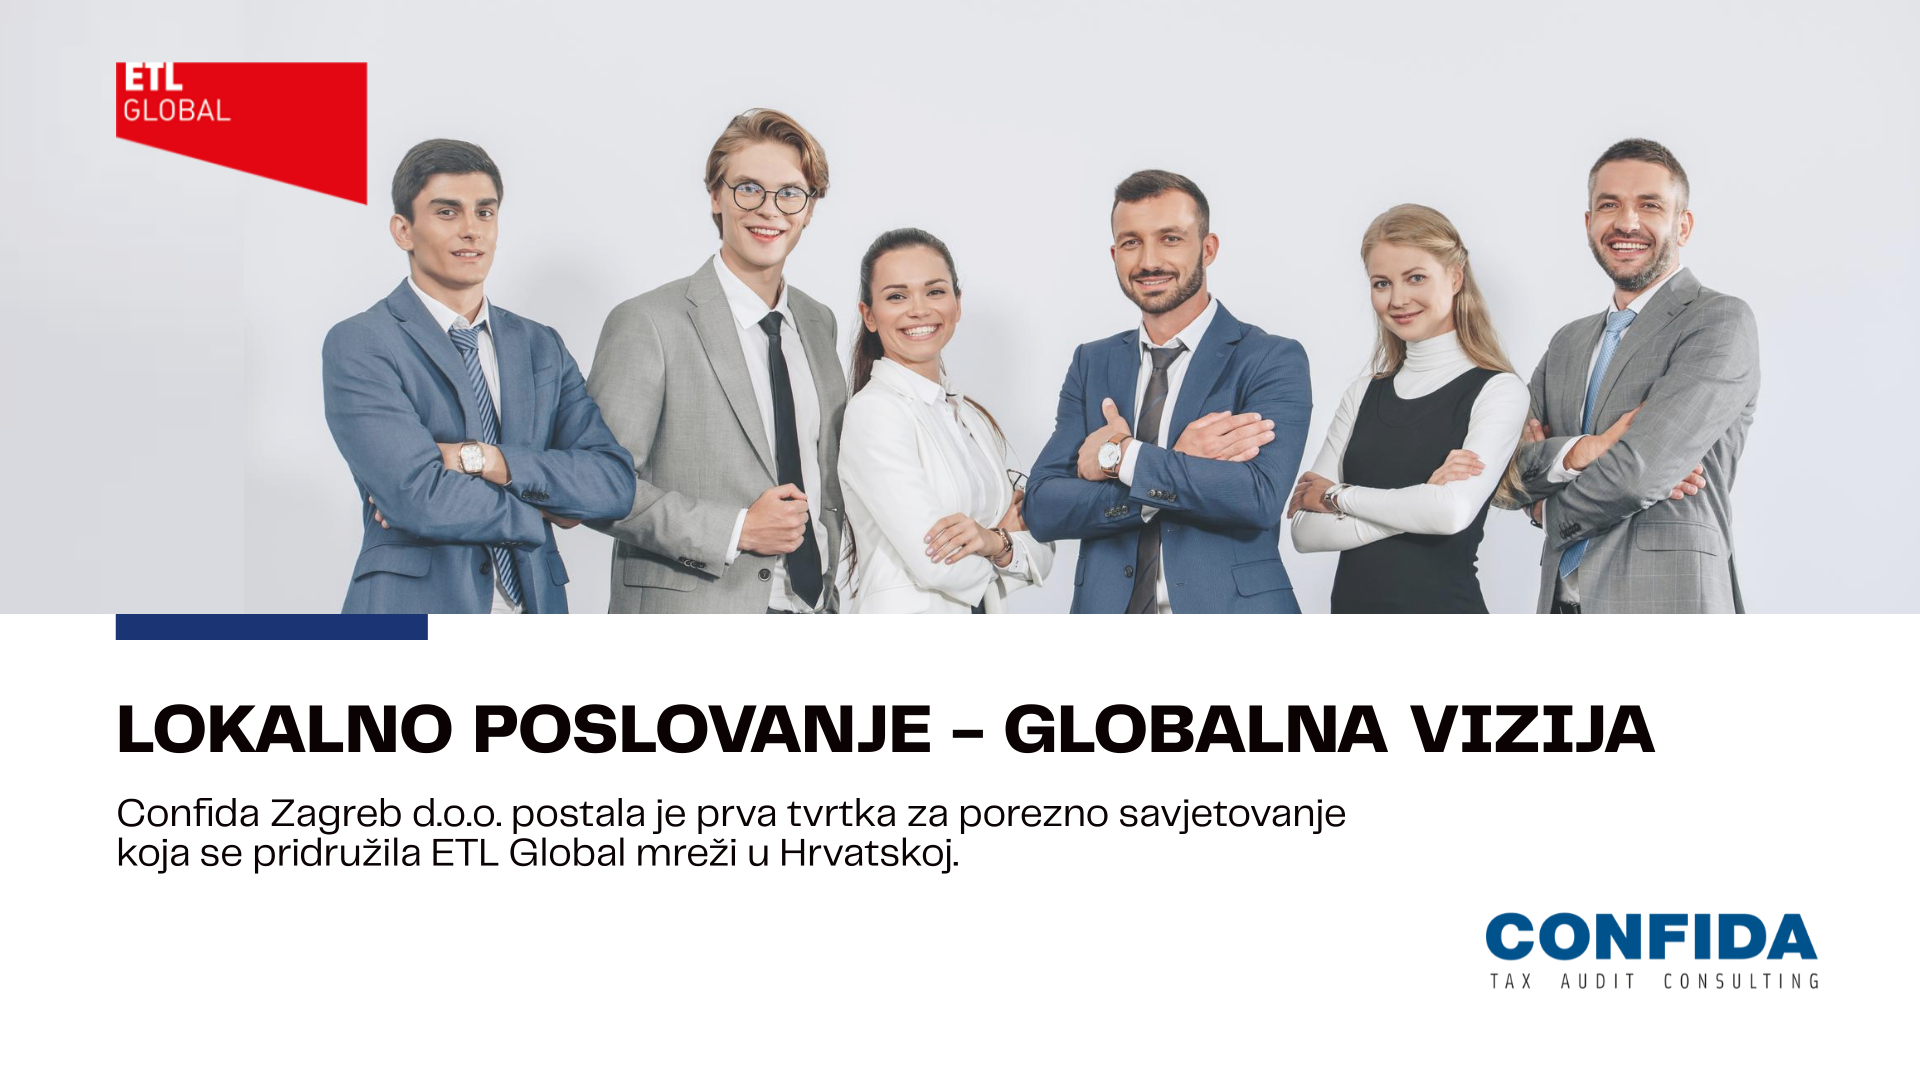 Lokalno poslovanje – globalna vizija – Confida Hrvatska pridružila se ETL Global mreži!